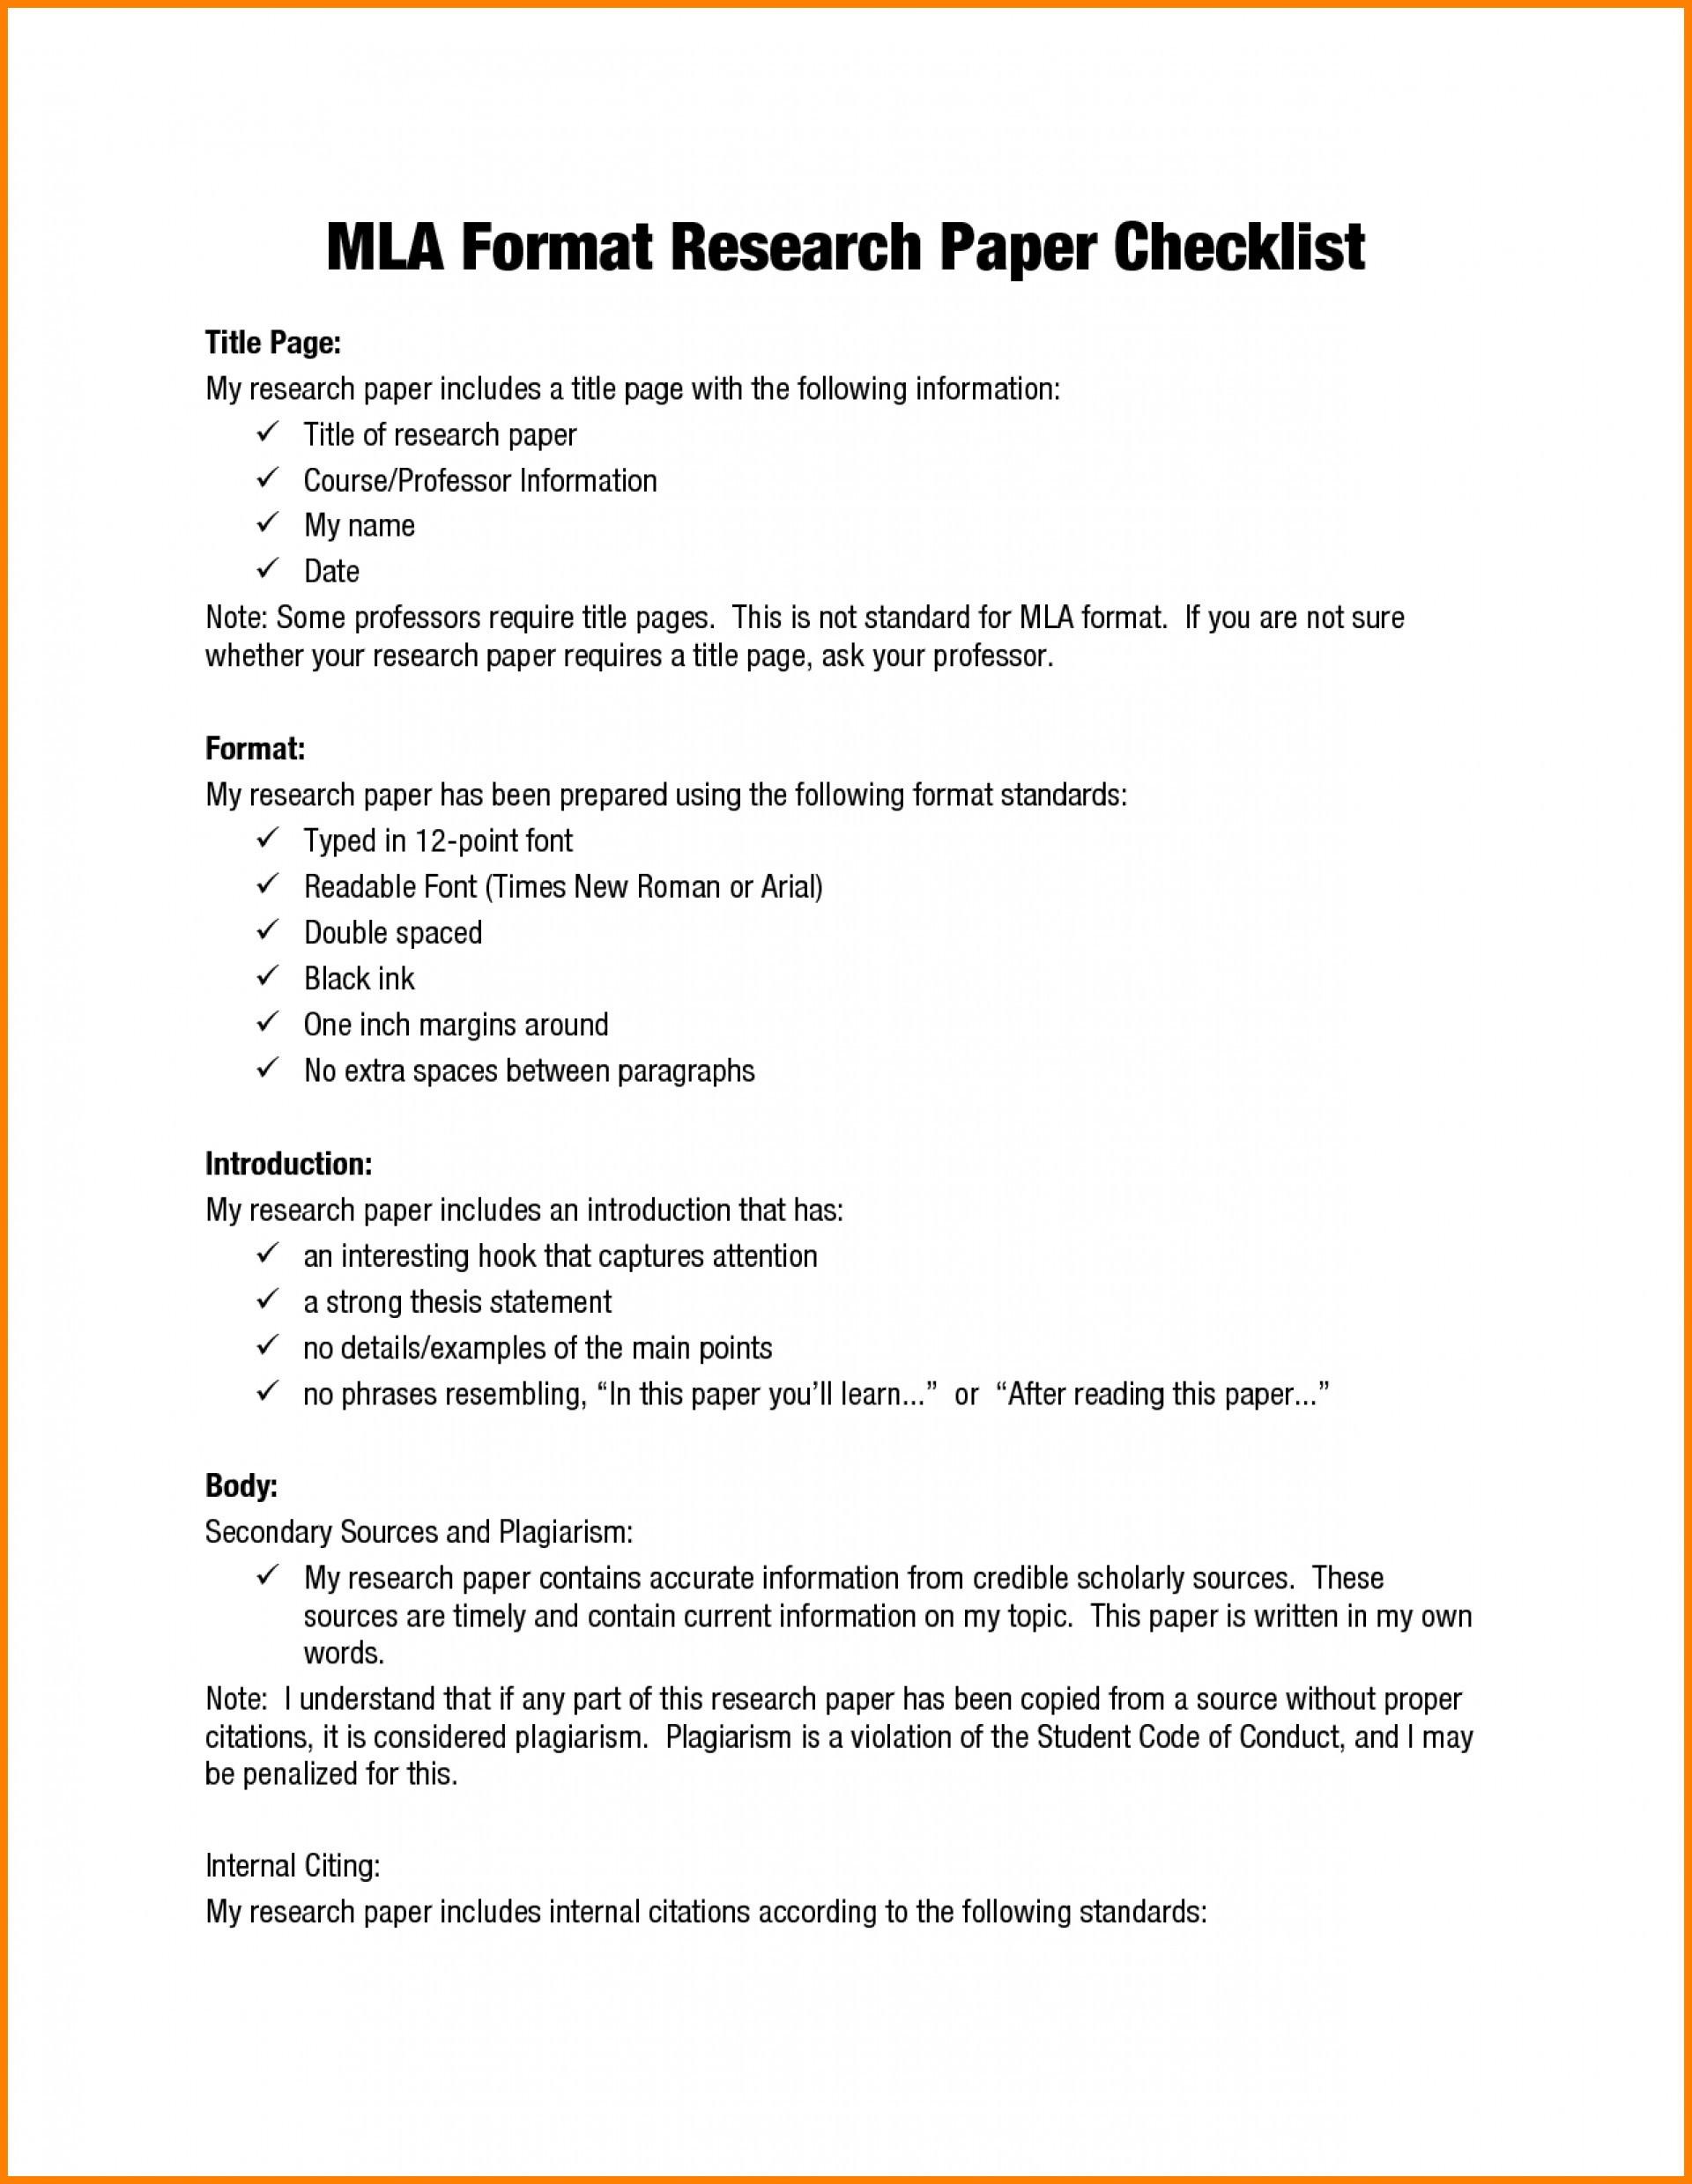 Mla Citation Practice Worksheet 005 Mla format Research Paper Works Cited In Text Citation